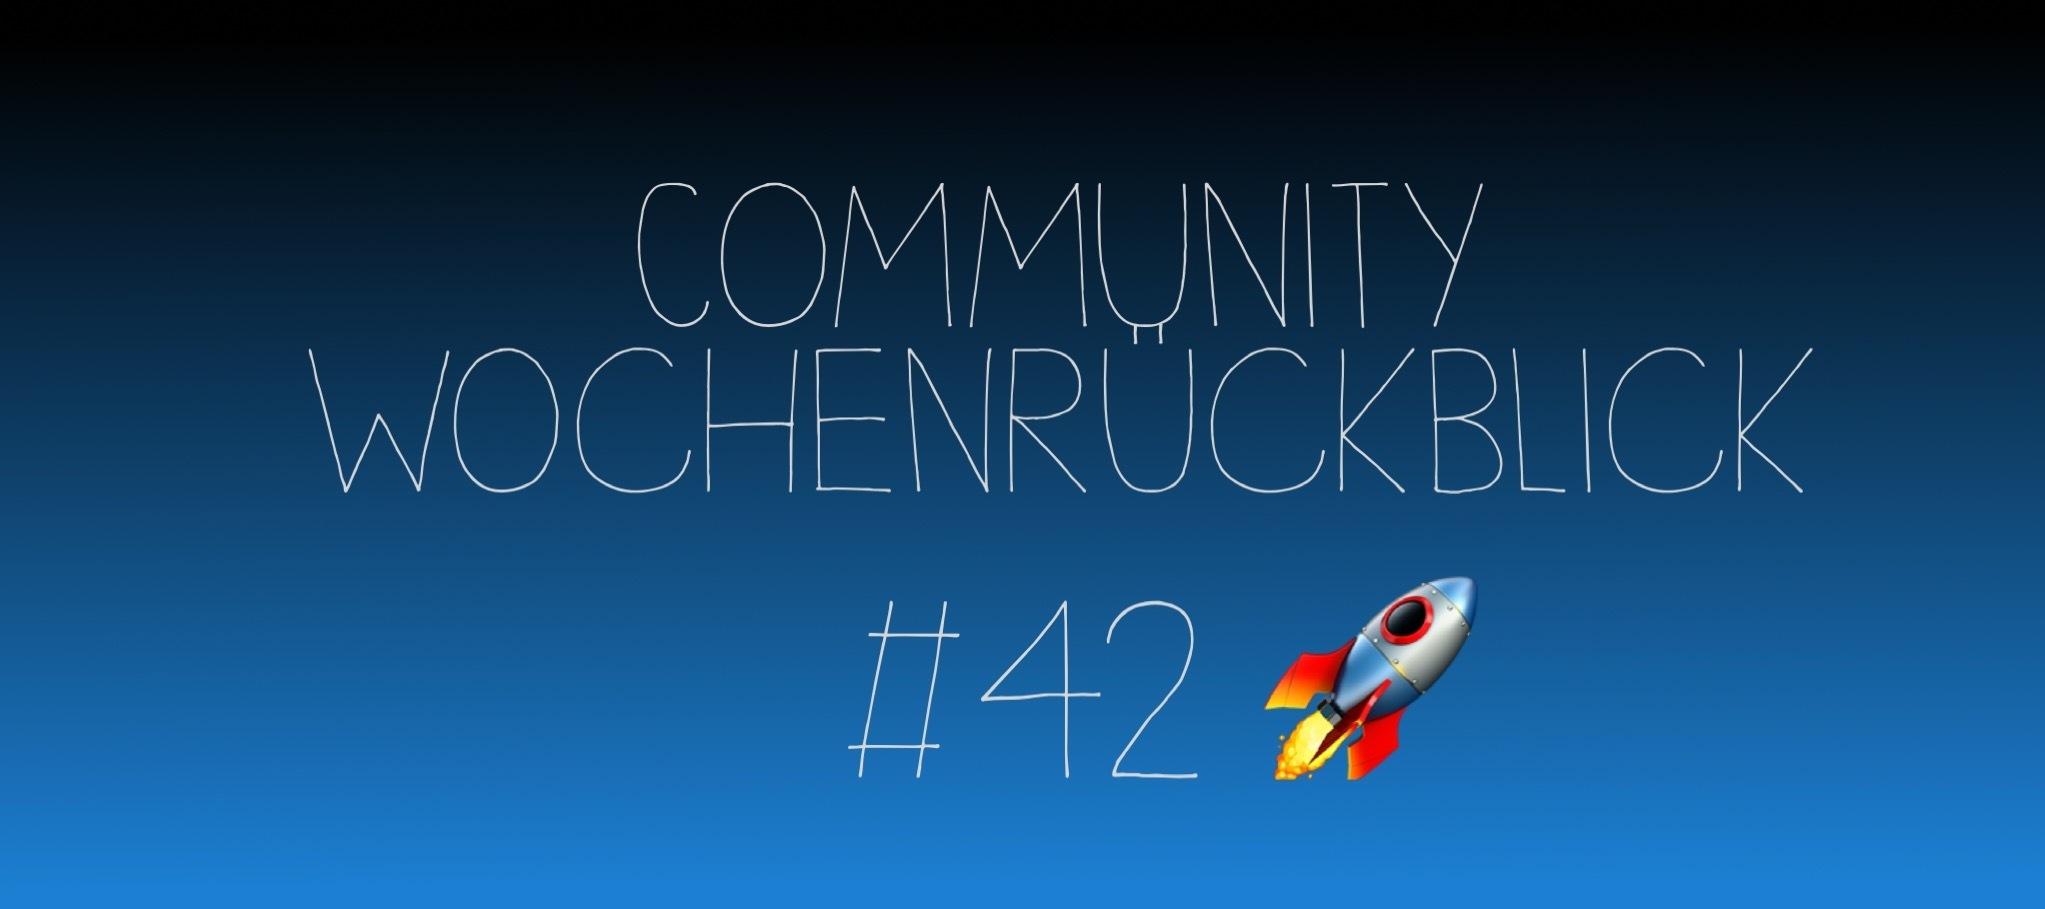 Community Wochenrückblick #42